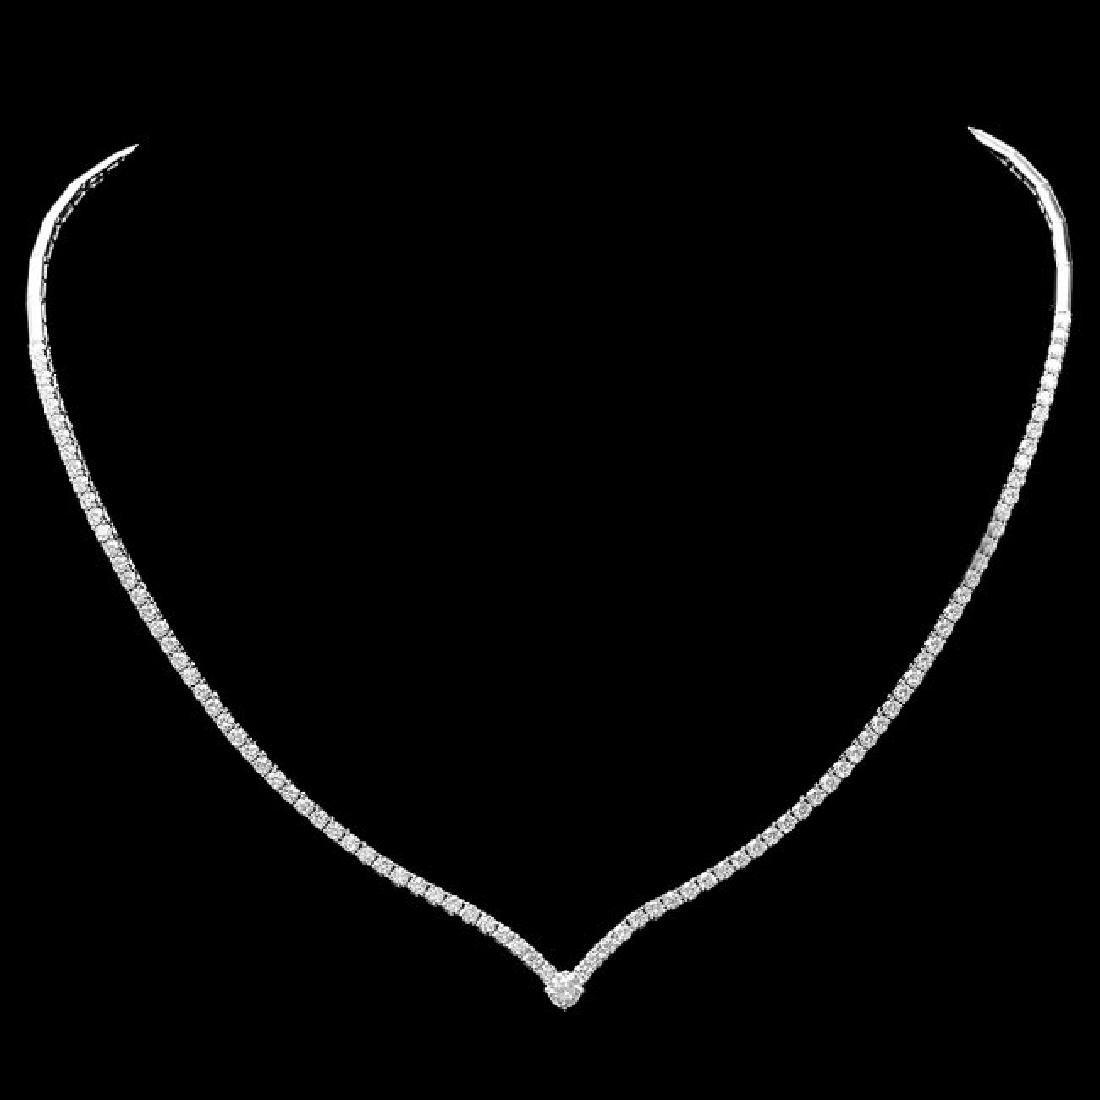 18k White Gold 3.50ct Diamond Necklace